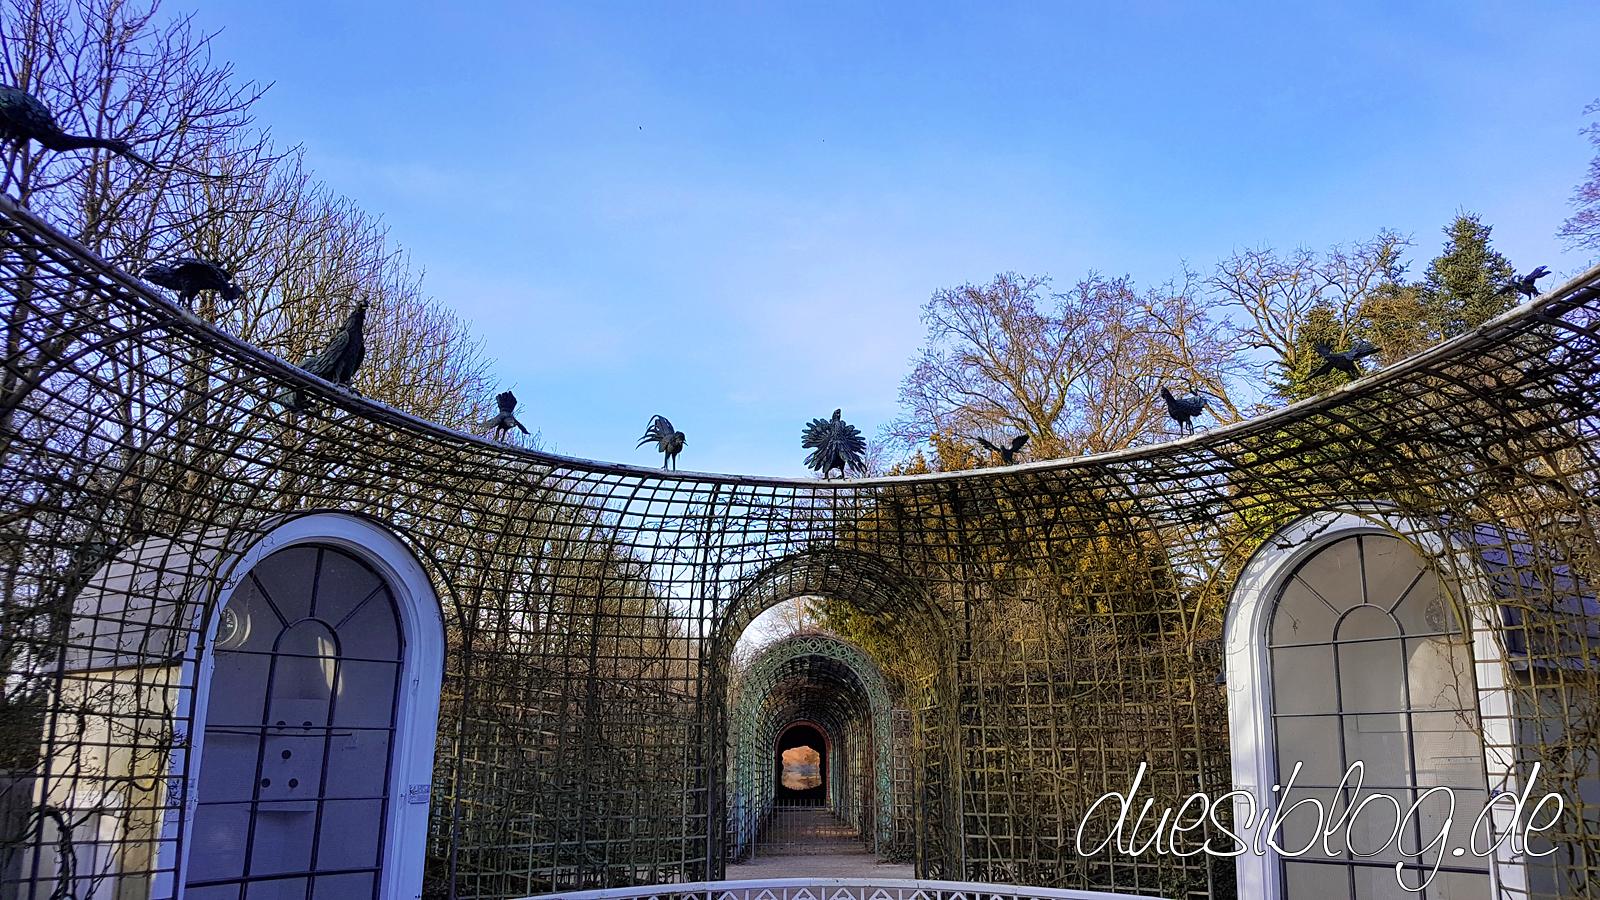 Perspektiv Ende der Welt Schwetzingen Schlosspark duesiblog 02